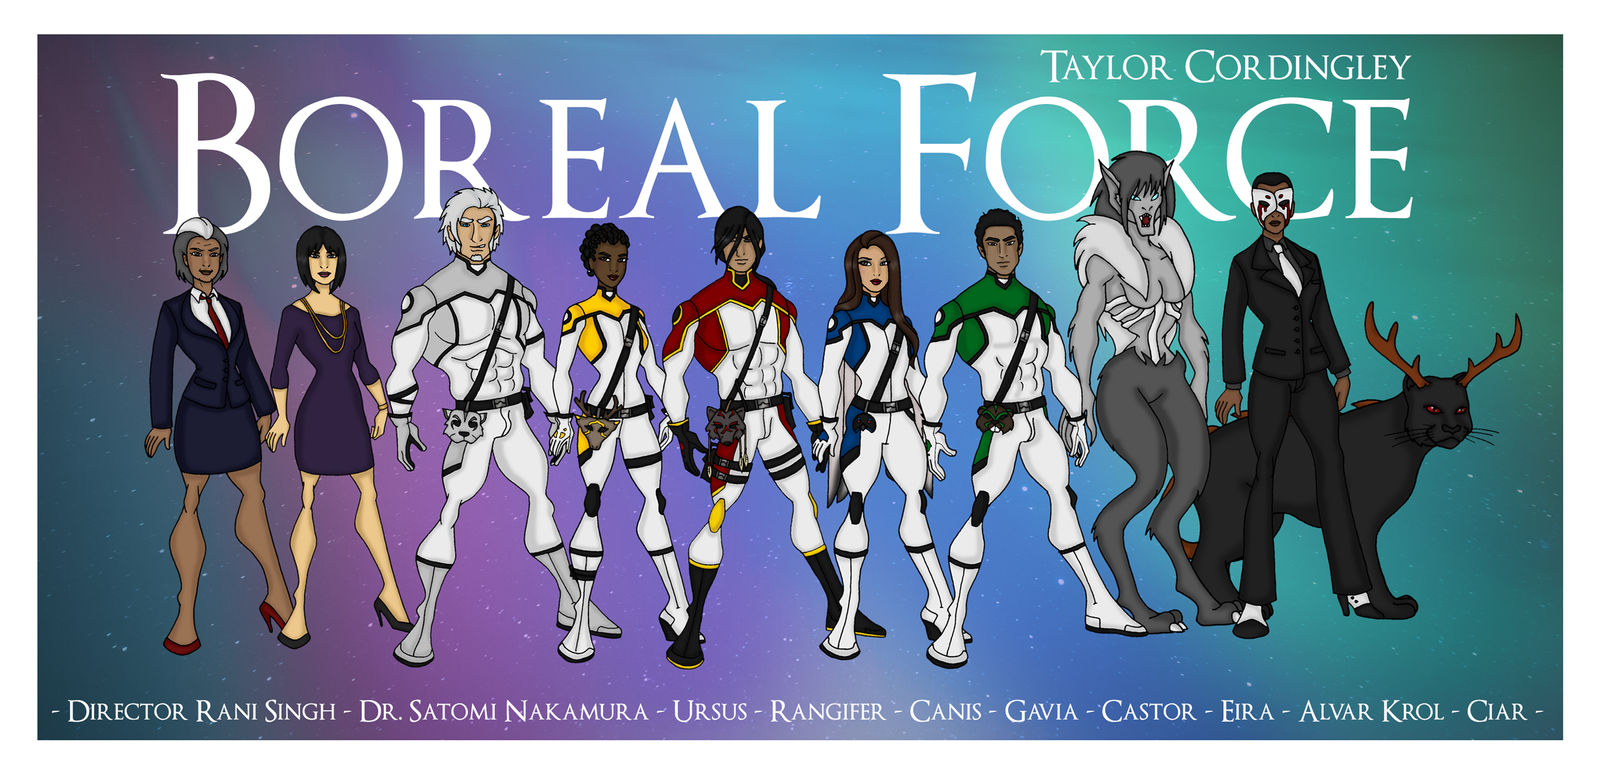 Boreal Force